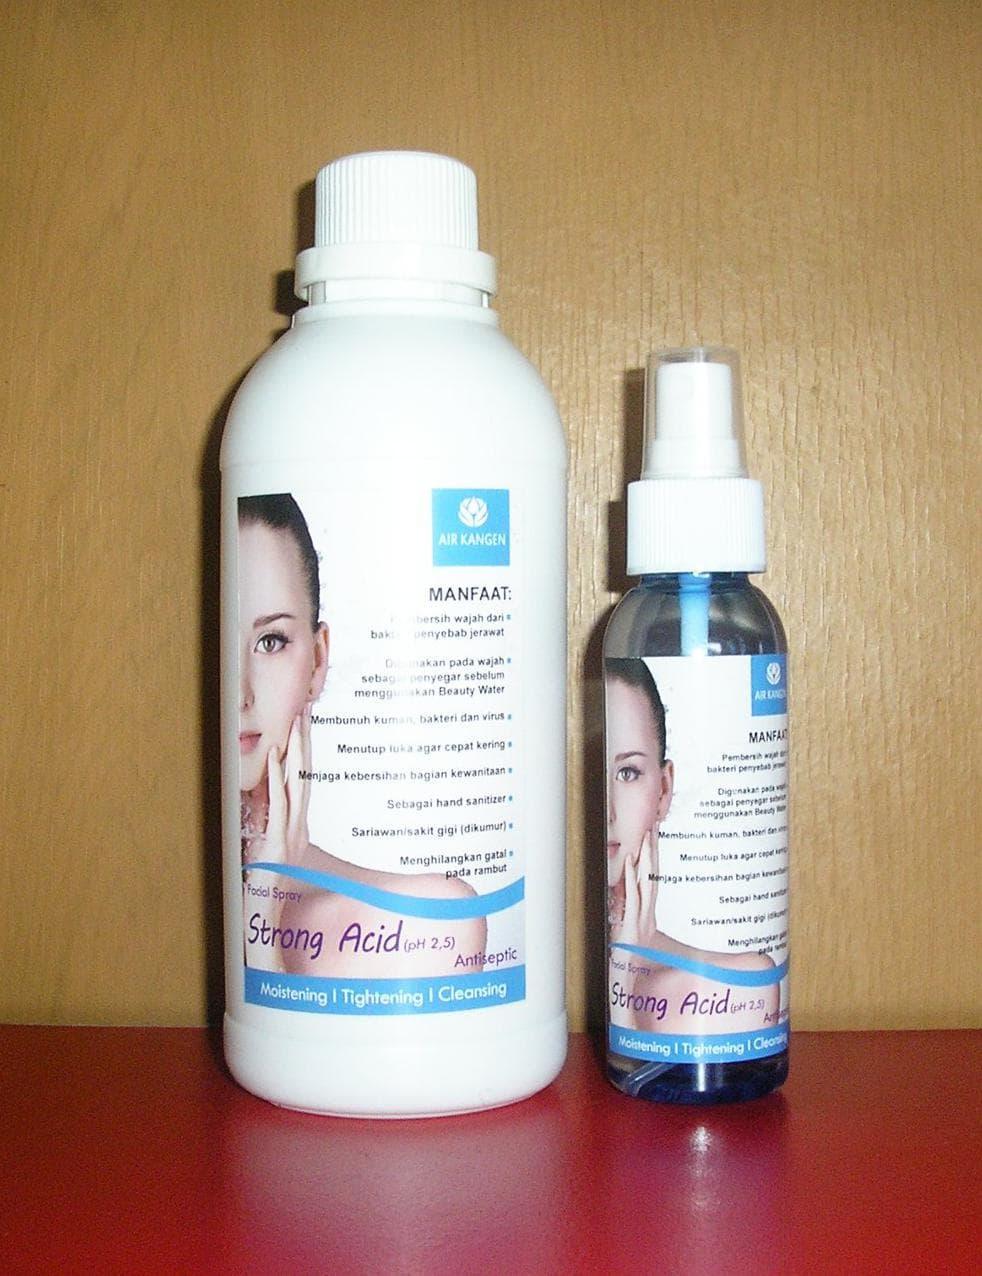 Jual Refill Strong Acid 500ml dan Strong Acid 100ml by - Kangen Water - bullish store | Tokopedia